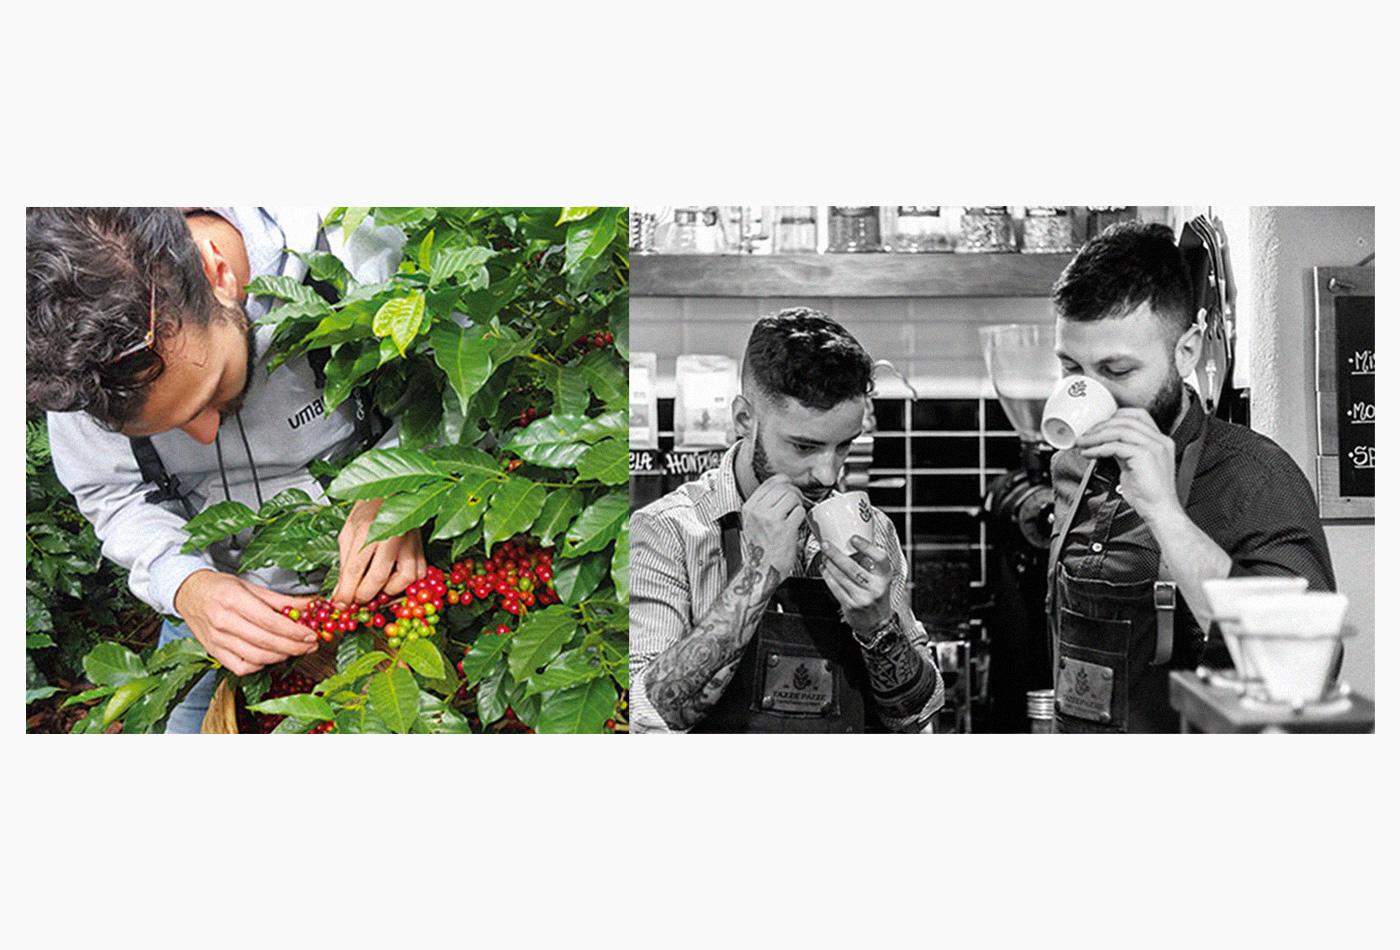 tazzepazze-tazze-pazze-caffetteria-gourmet-genova-coffee-specialty-brewing-andrea-cremone-barista-baristas-branding-vacaliebres-honduras